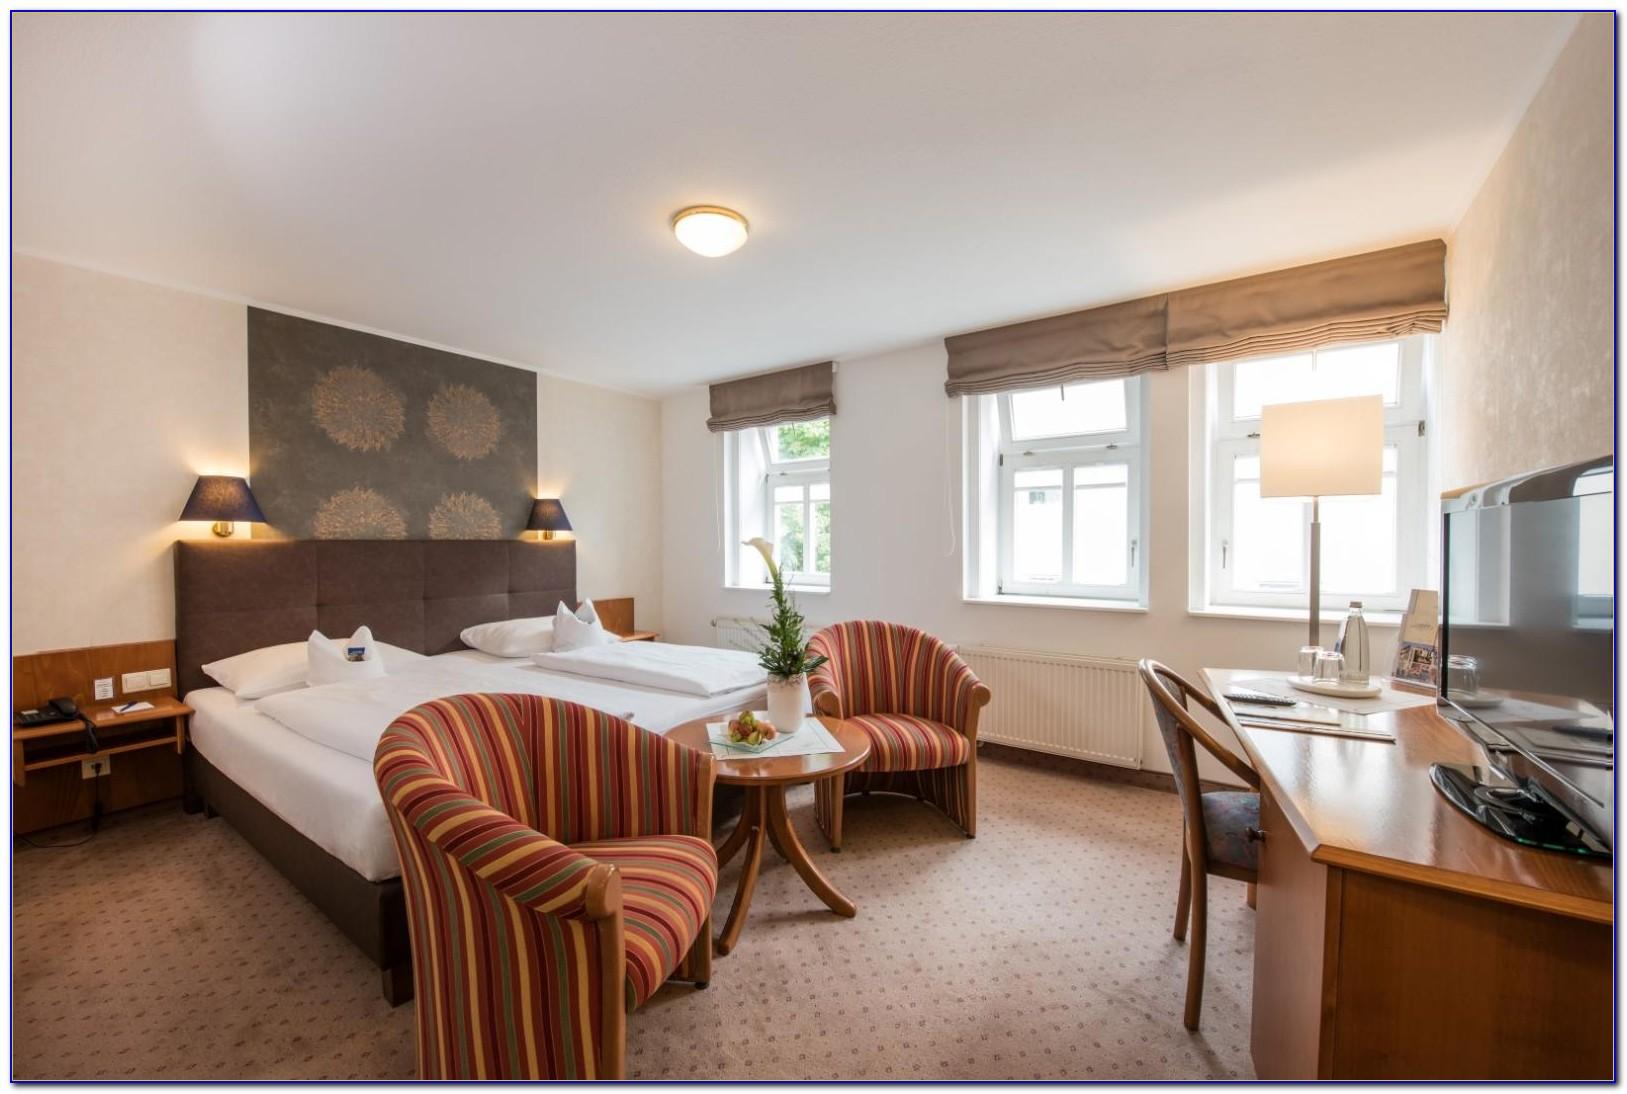 Goebels Sofien Hotel Eisenach